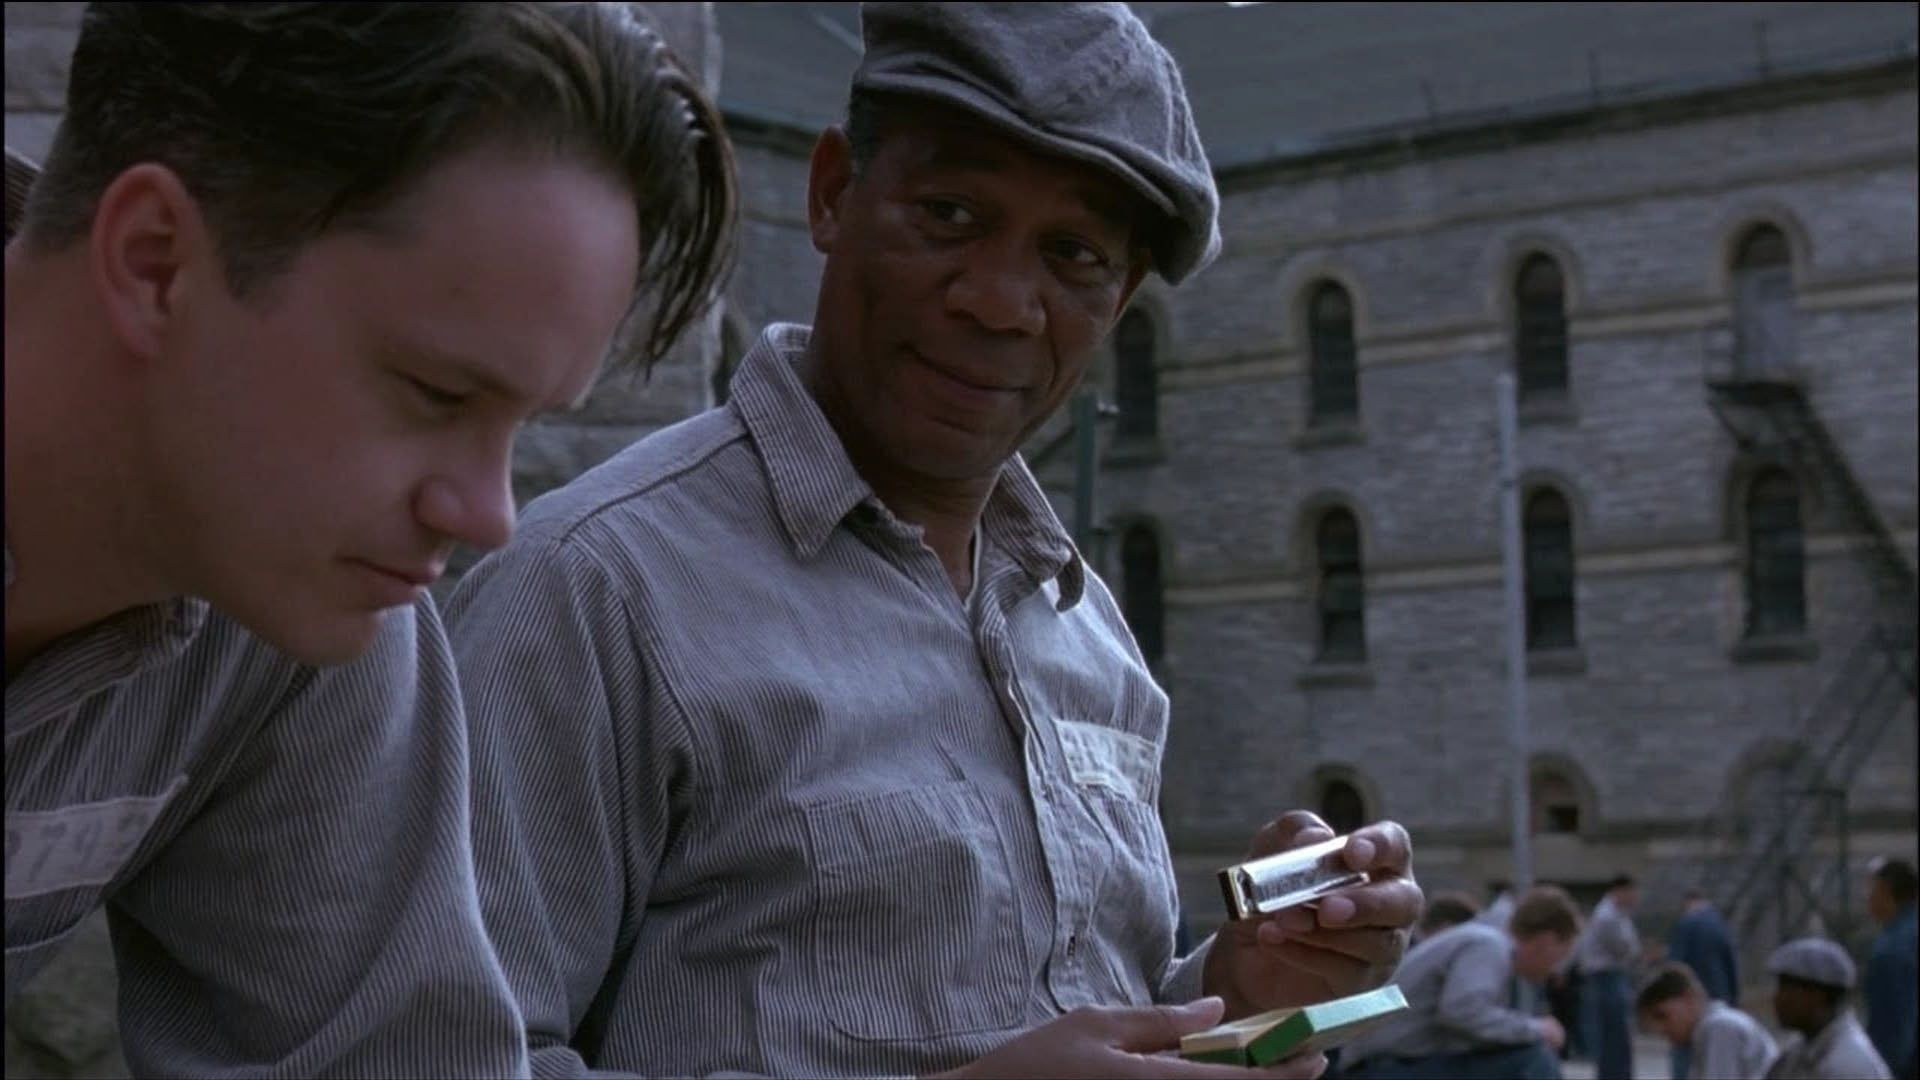 Bankiren Andy Dufresne Tim Robbins Borjar Ett Nytt Liv I Fangelse Efter Att Ha Blivit Dit The Shawshank Redemption Full Movies Online Free Free Movies Online